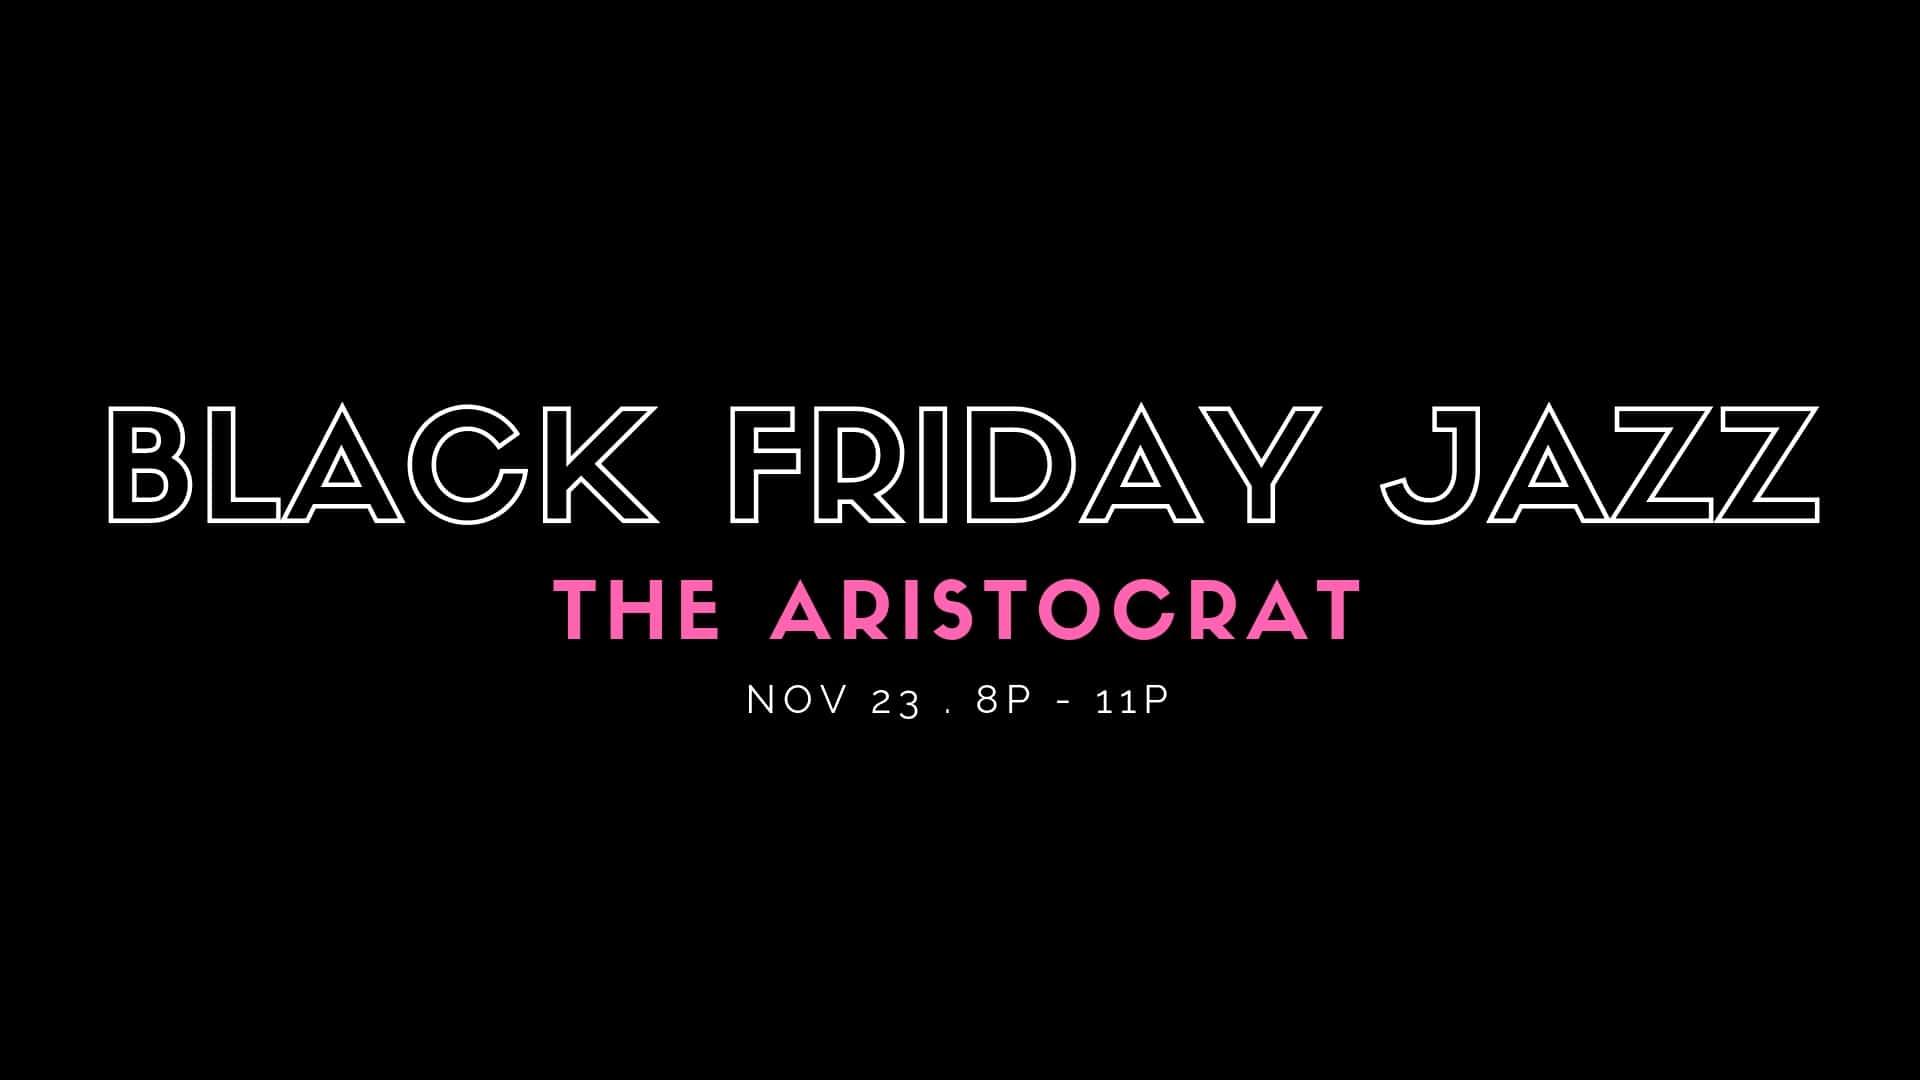 Black Friday Jazz